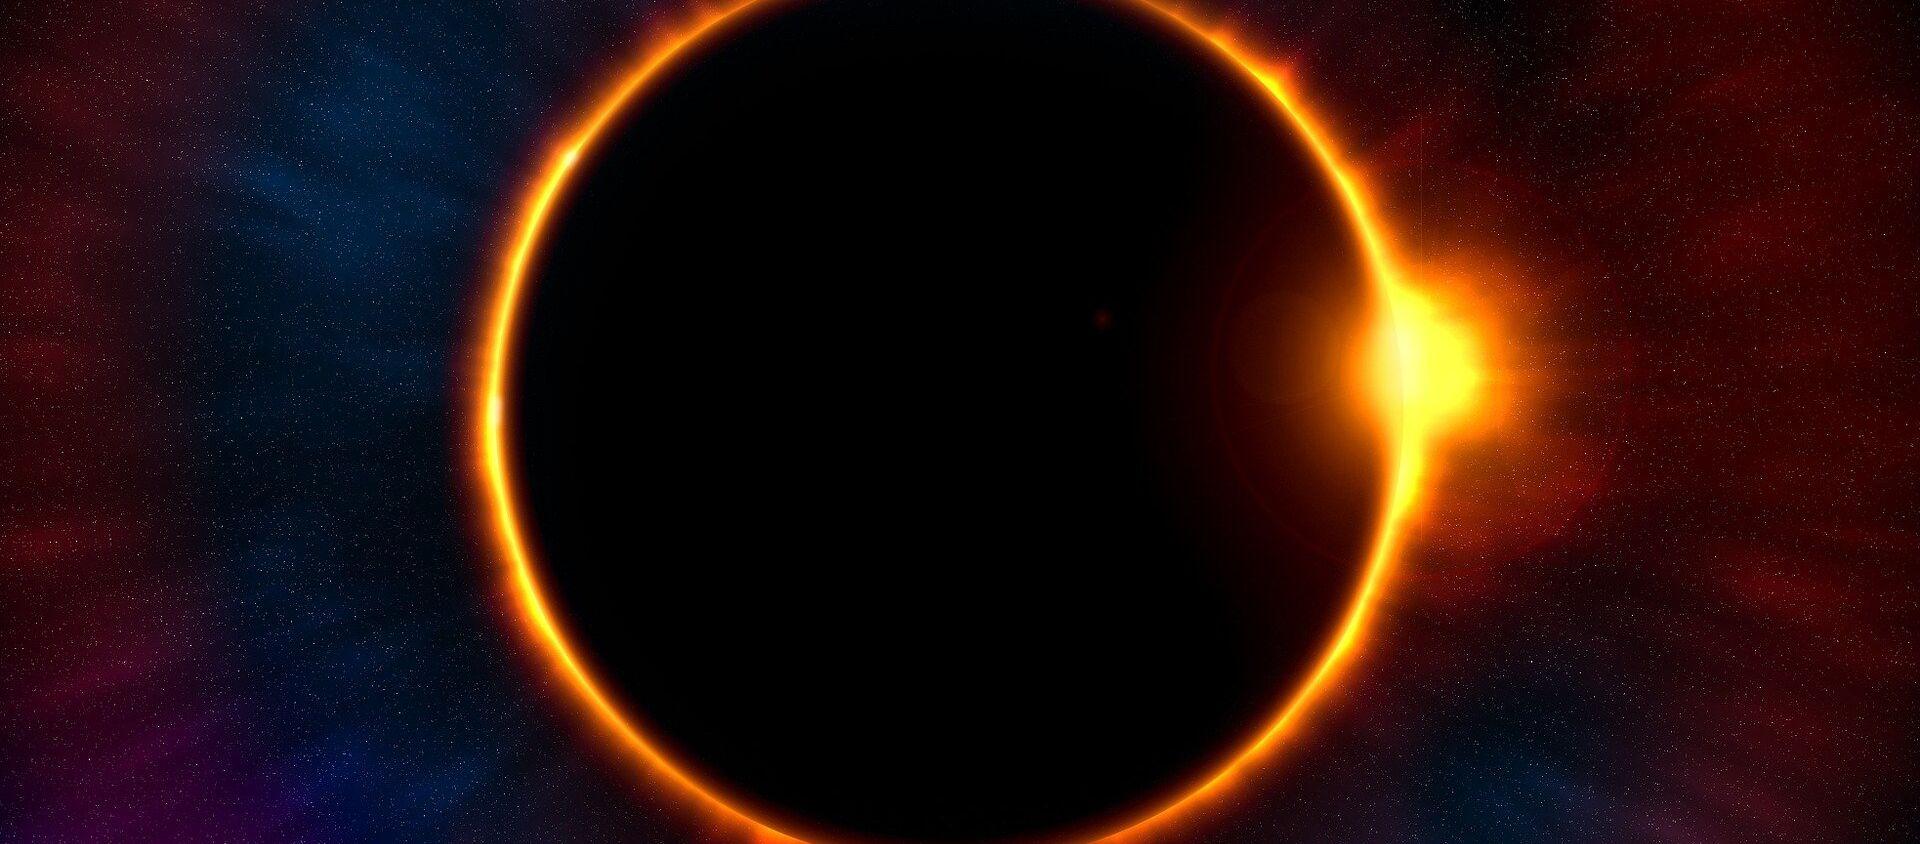 Eclissi solare - Sputnik Italia, 1920, 17.06.2020